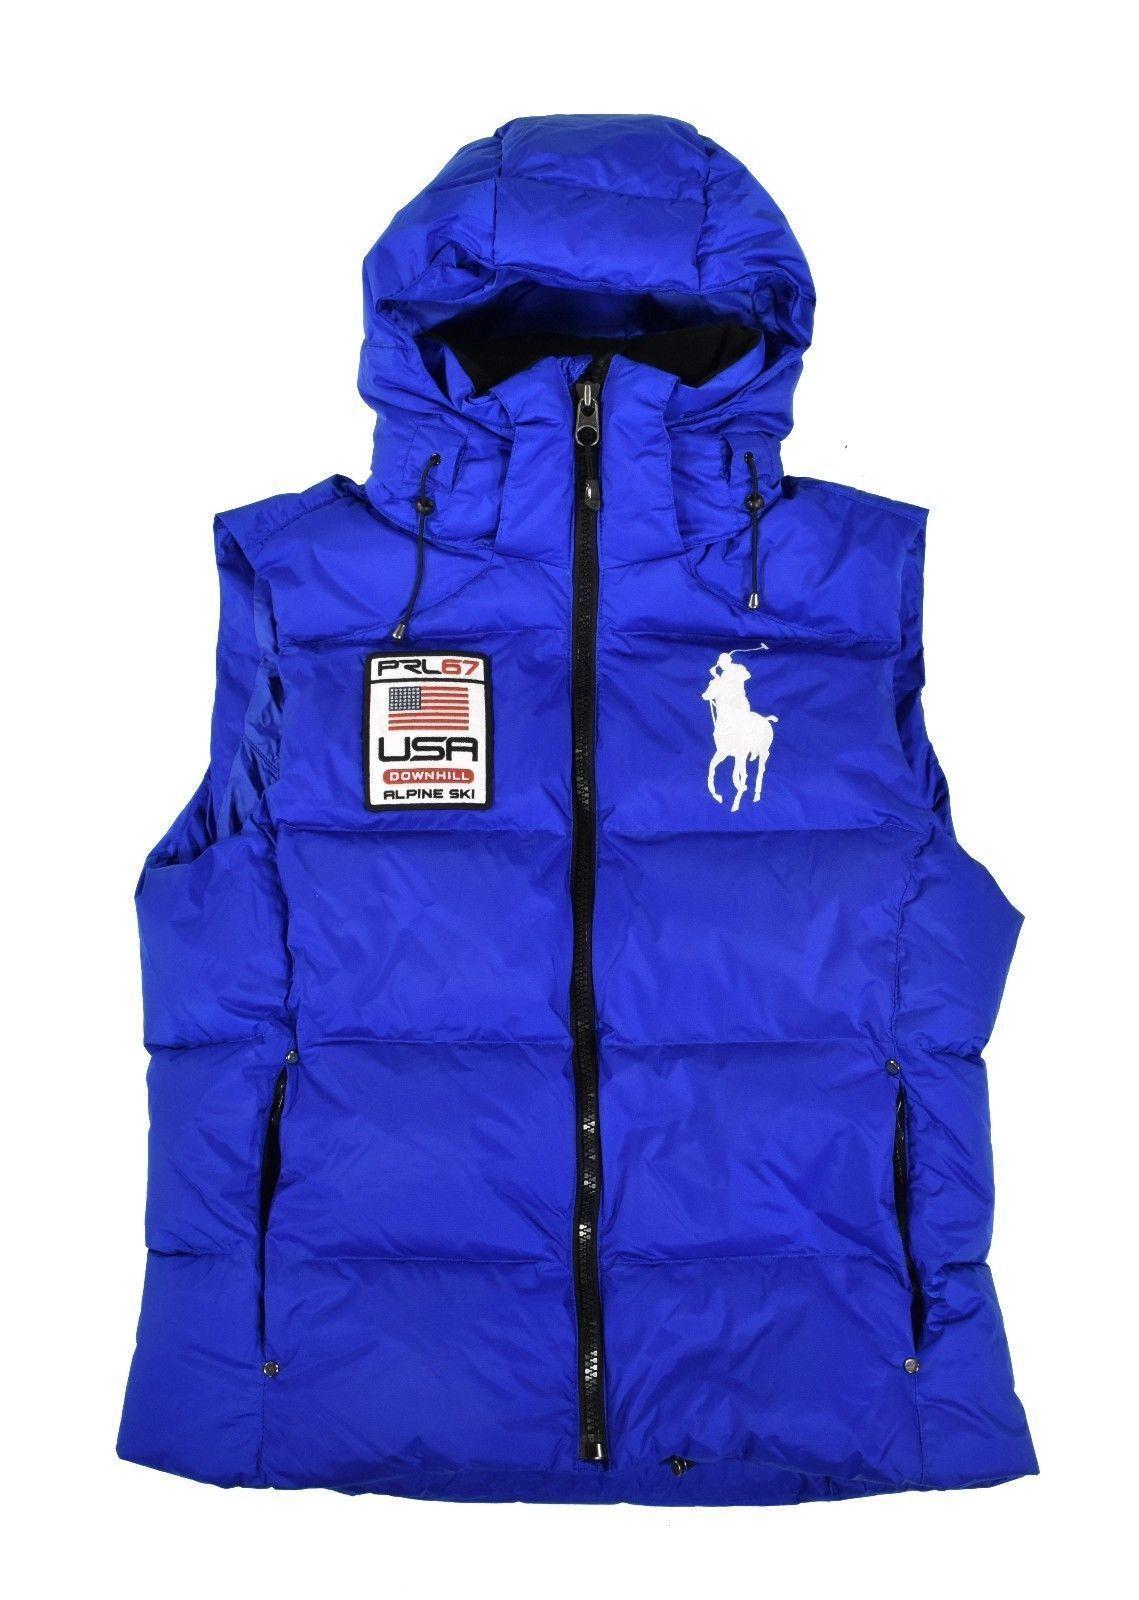 Polo Ralph Lauren Men's Coats, Jackets & Vests for Sale   Shop New & Used    eBay